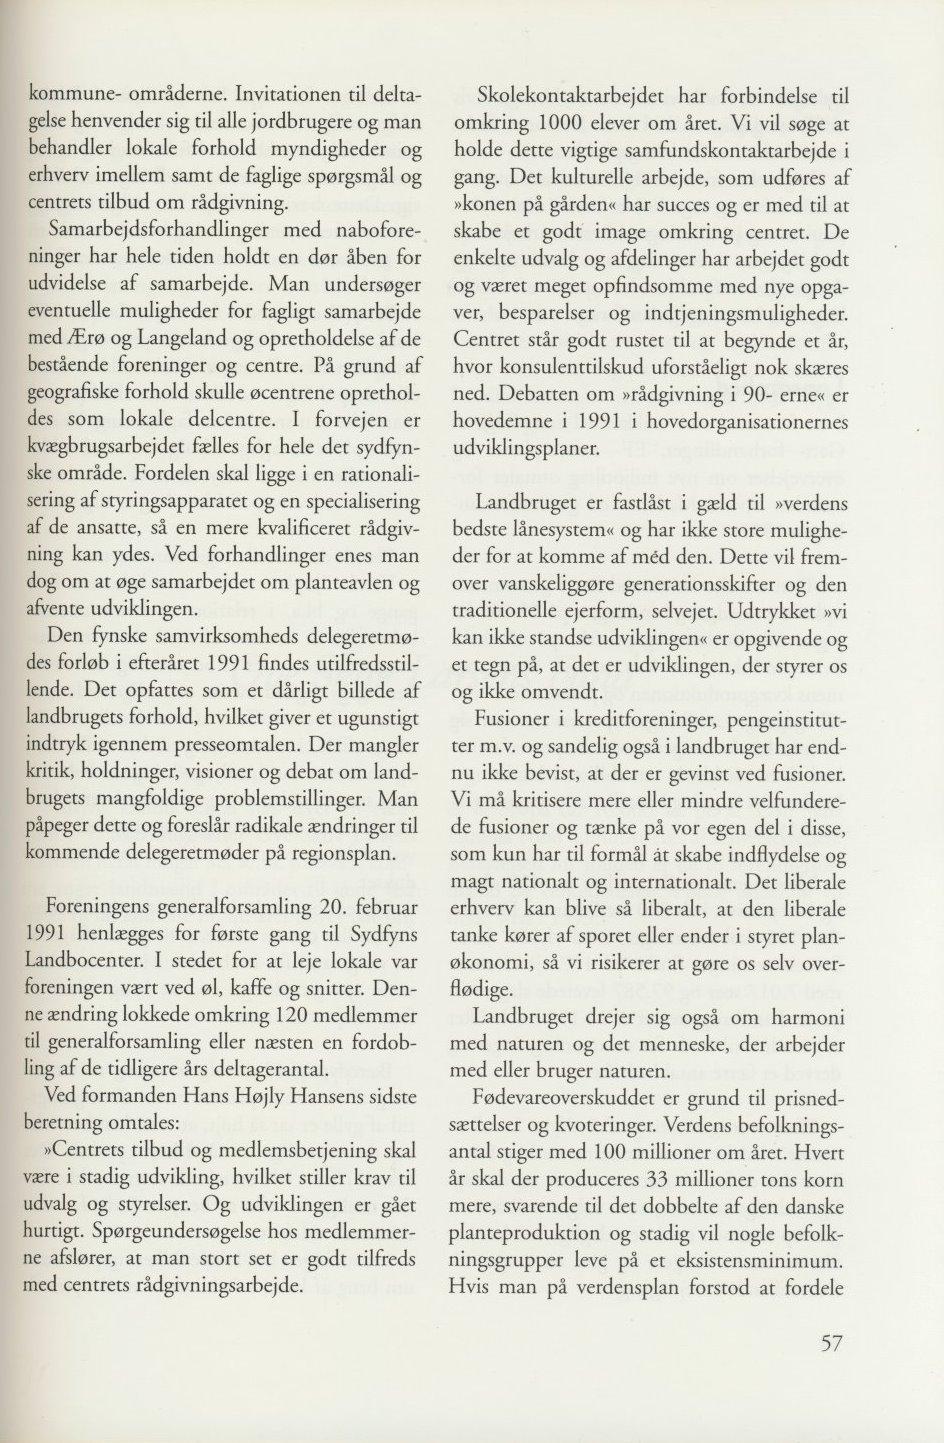 Sv. & Omegns landbf 1901-2001 - Det sydfynske bondeoprør (7)